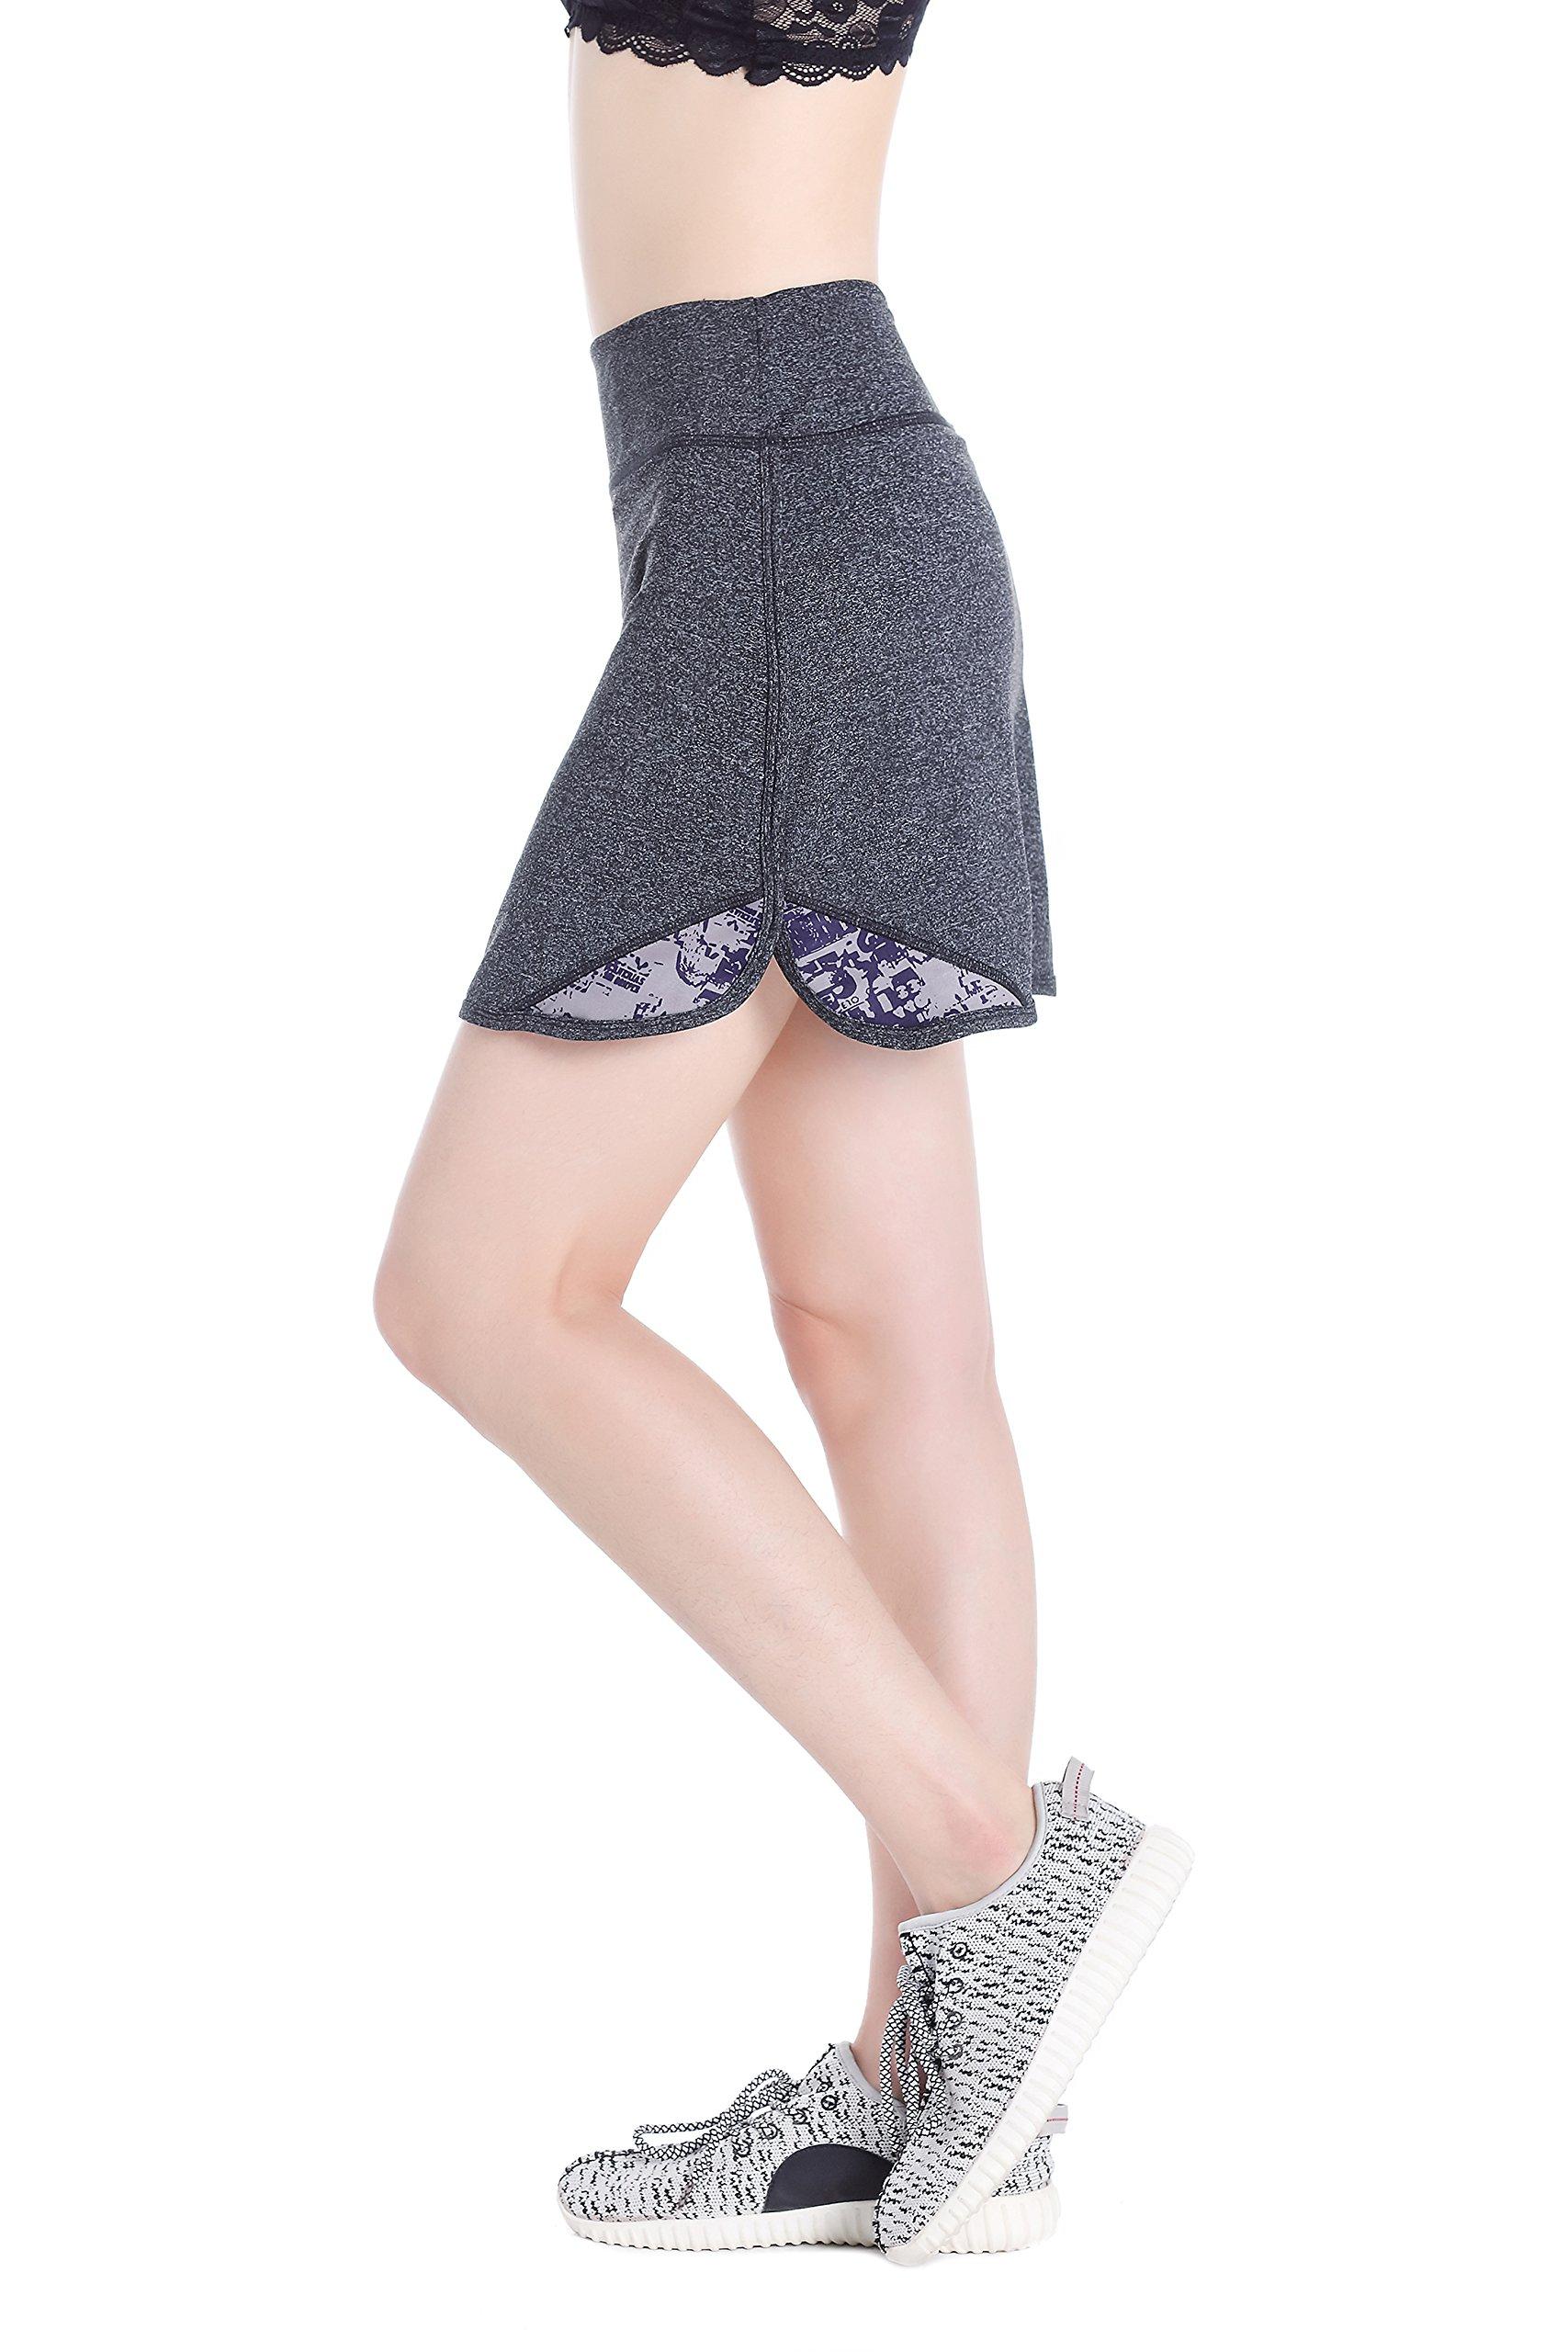 Annjoli Womens Running Skirt Casual Gym Tennis Skort for Workout, Golf, Gym (S, Gray/Pattern)